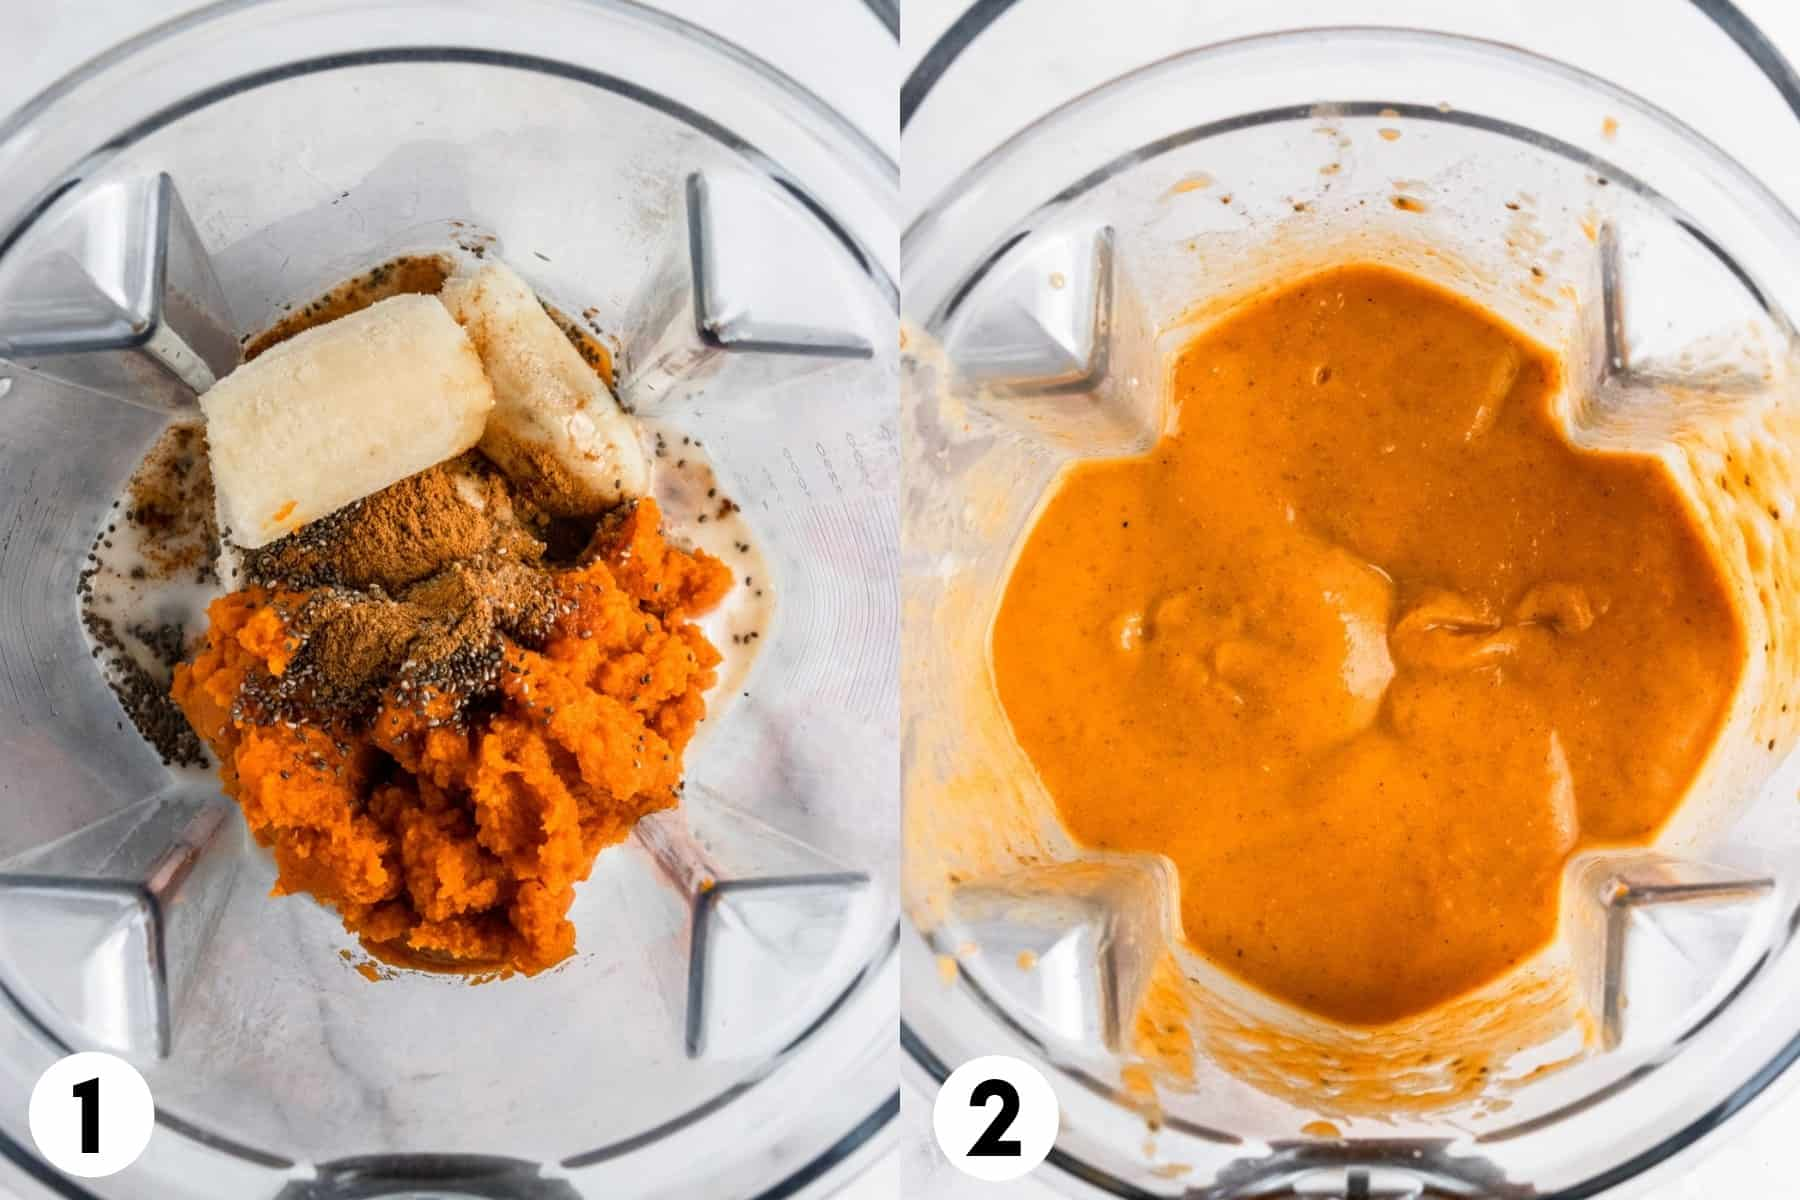 Ingredients in blender before and after blending.